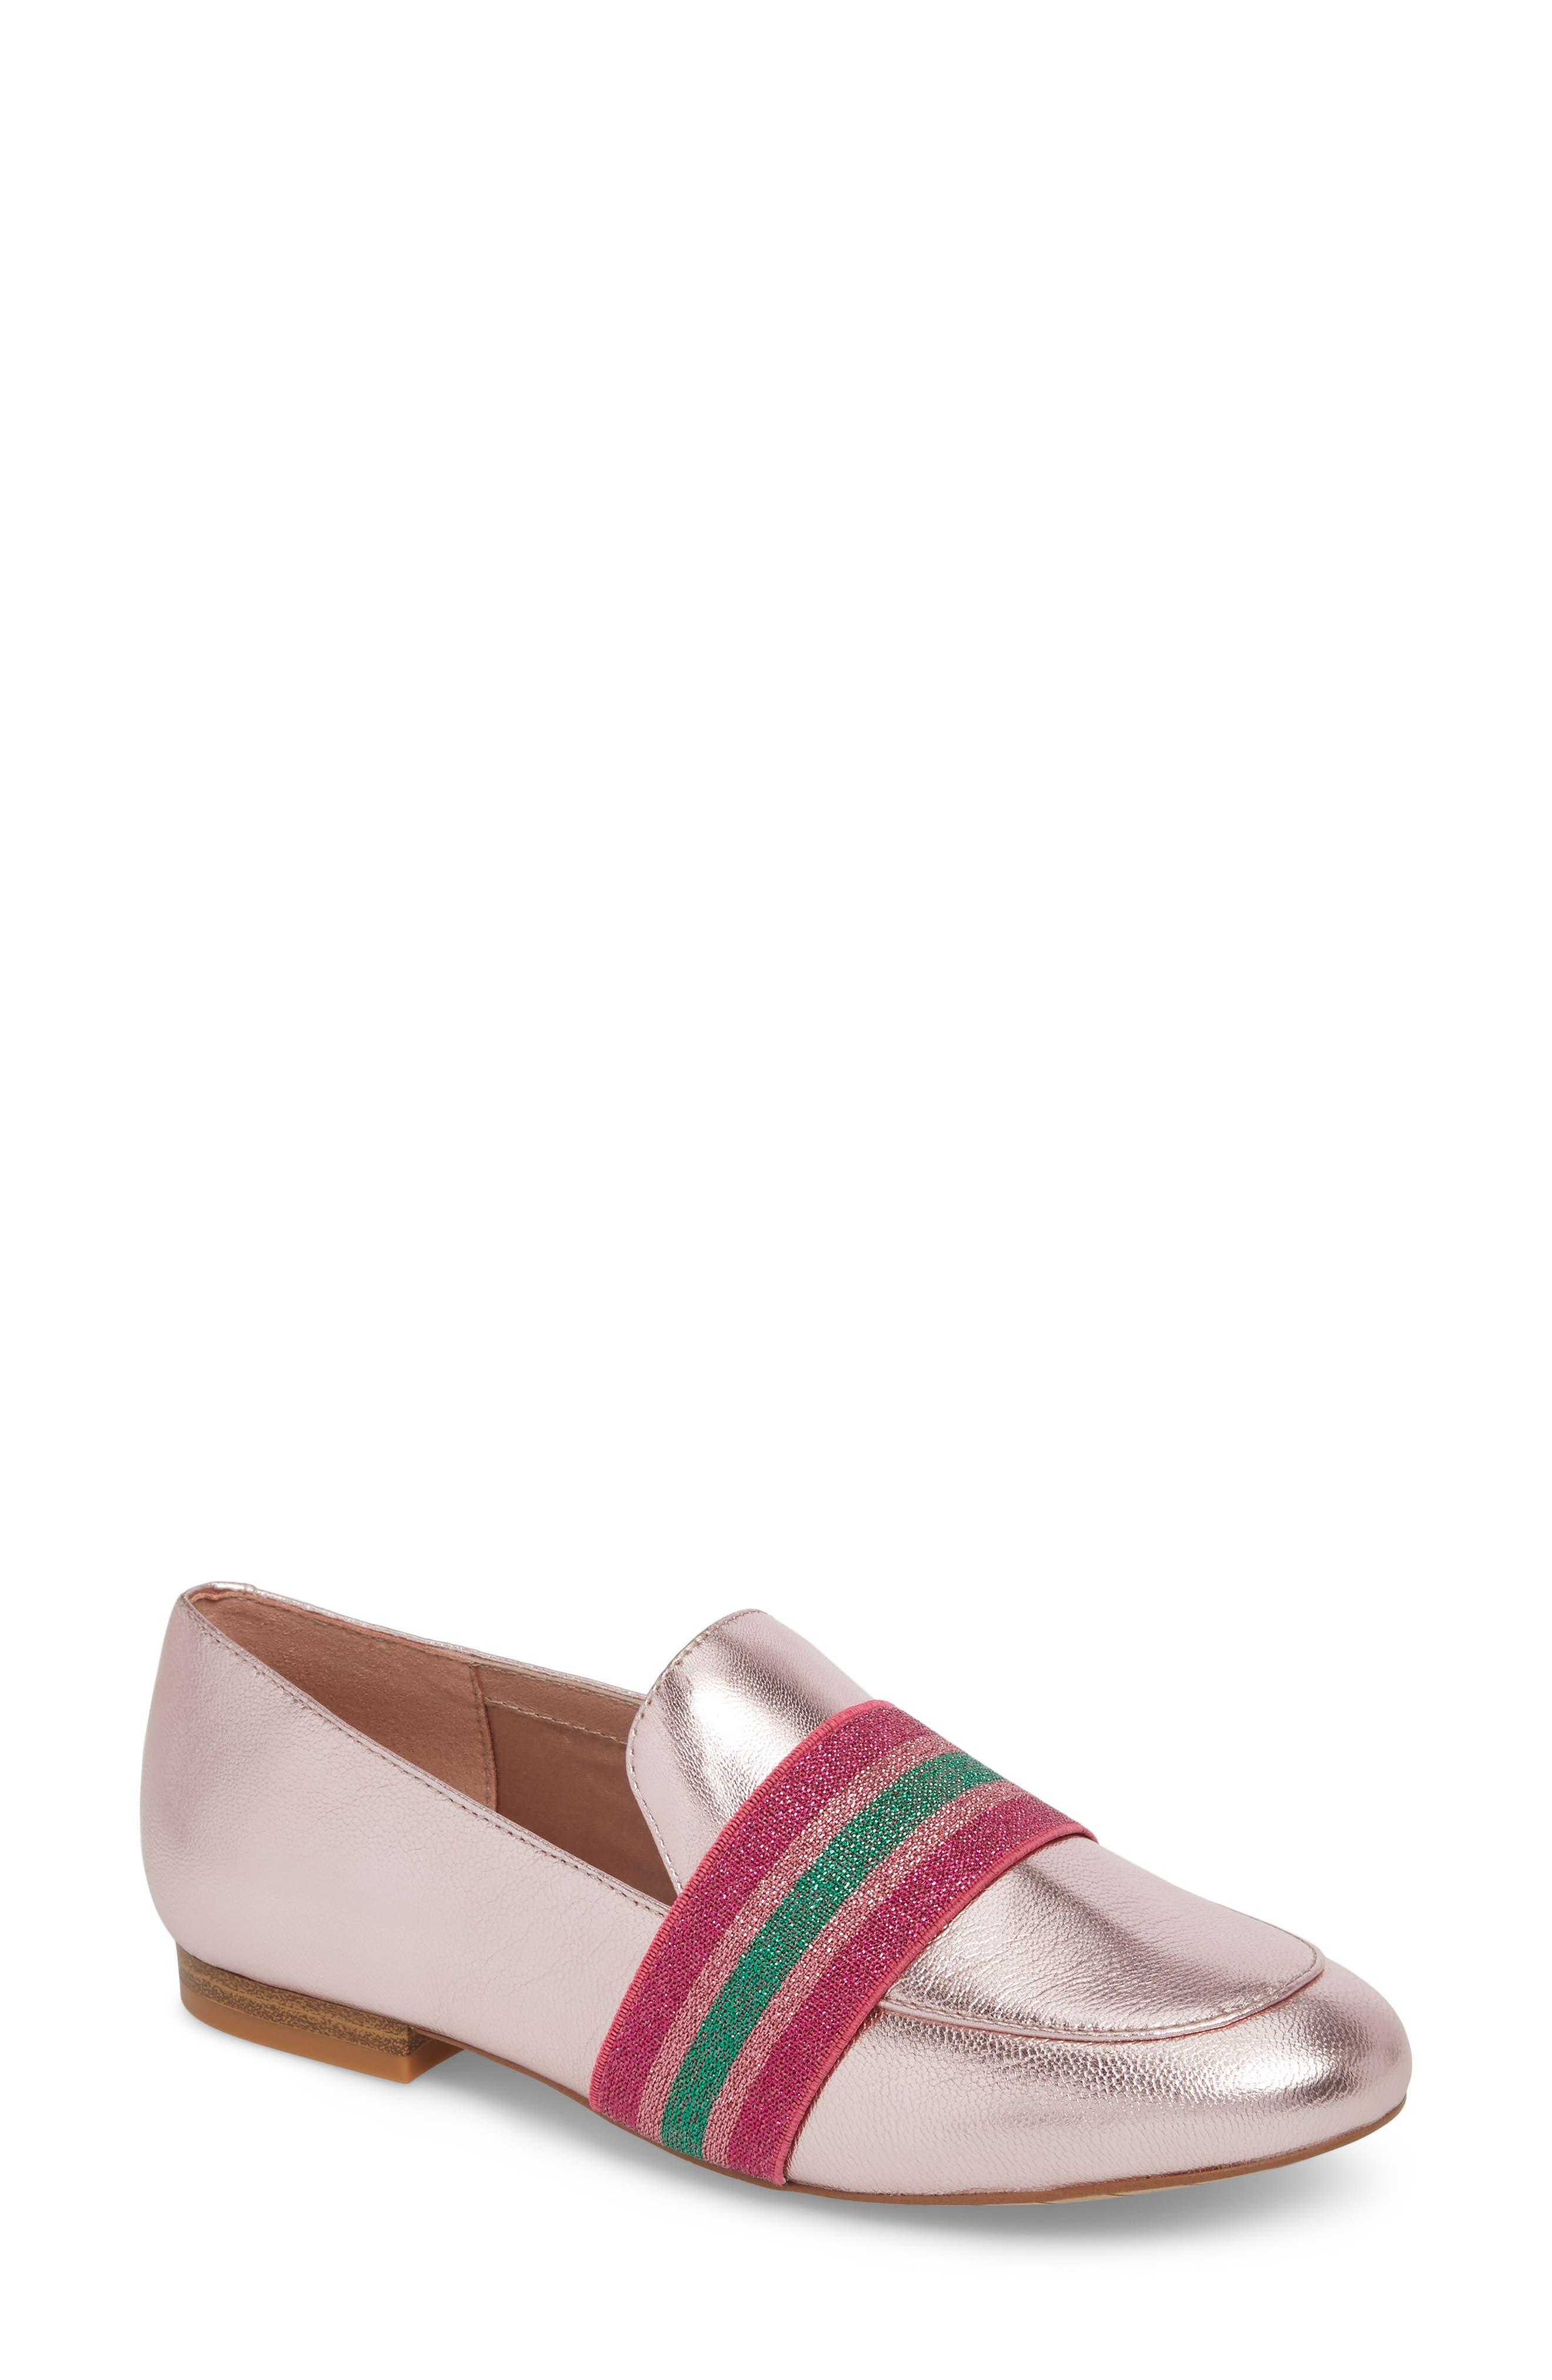 Walden Loafer,                         Main,                         color, Pink Metallic Leather